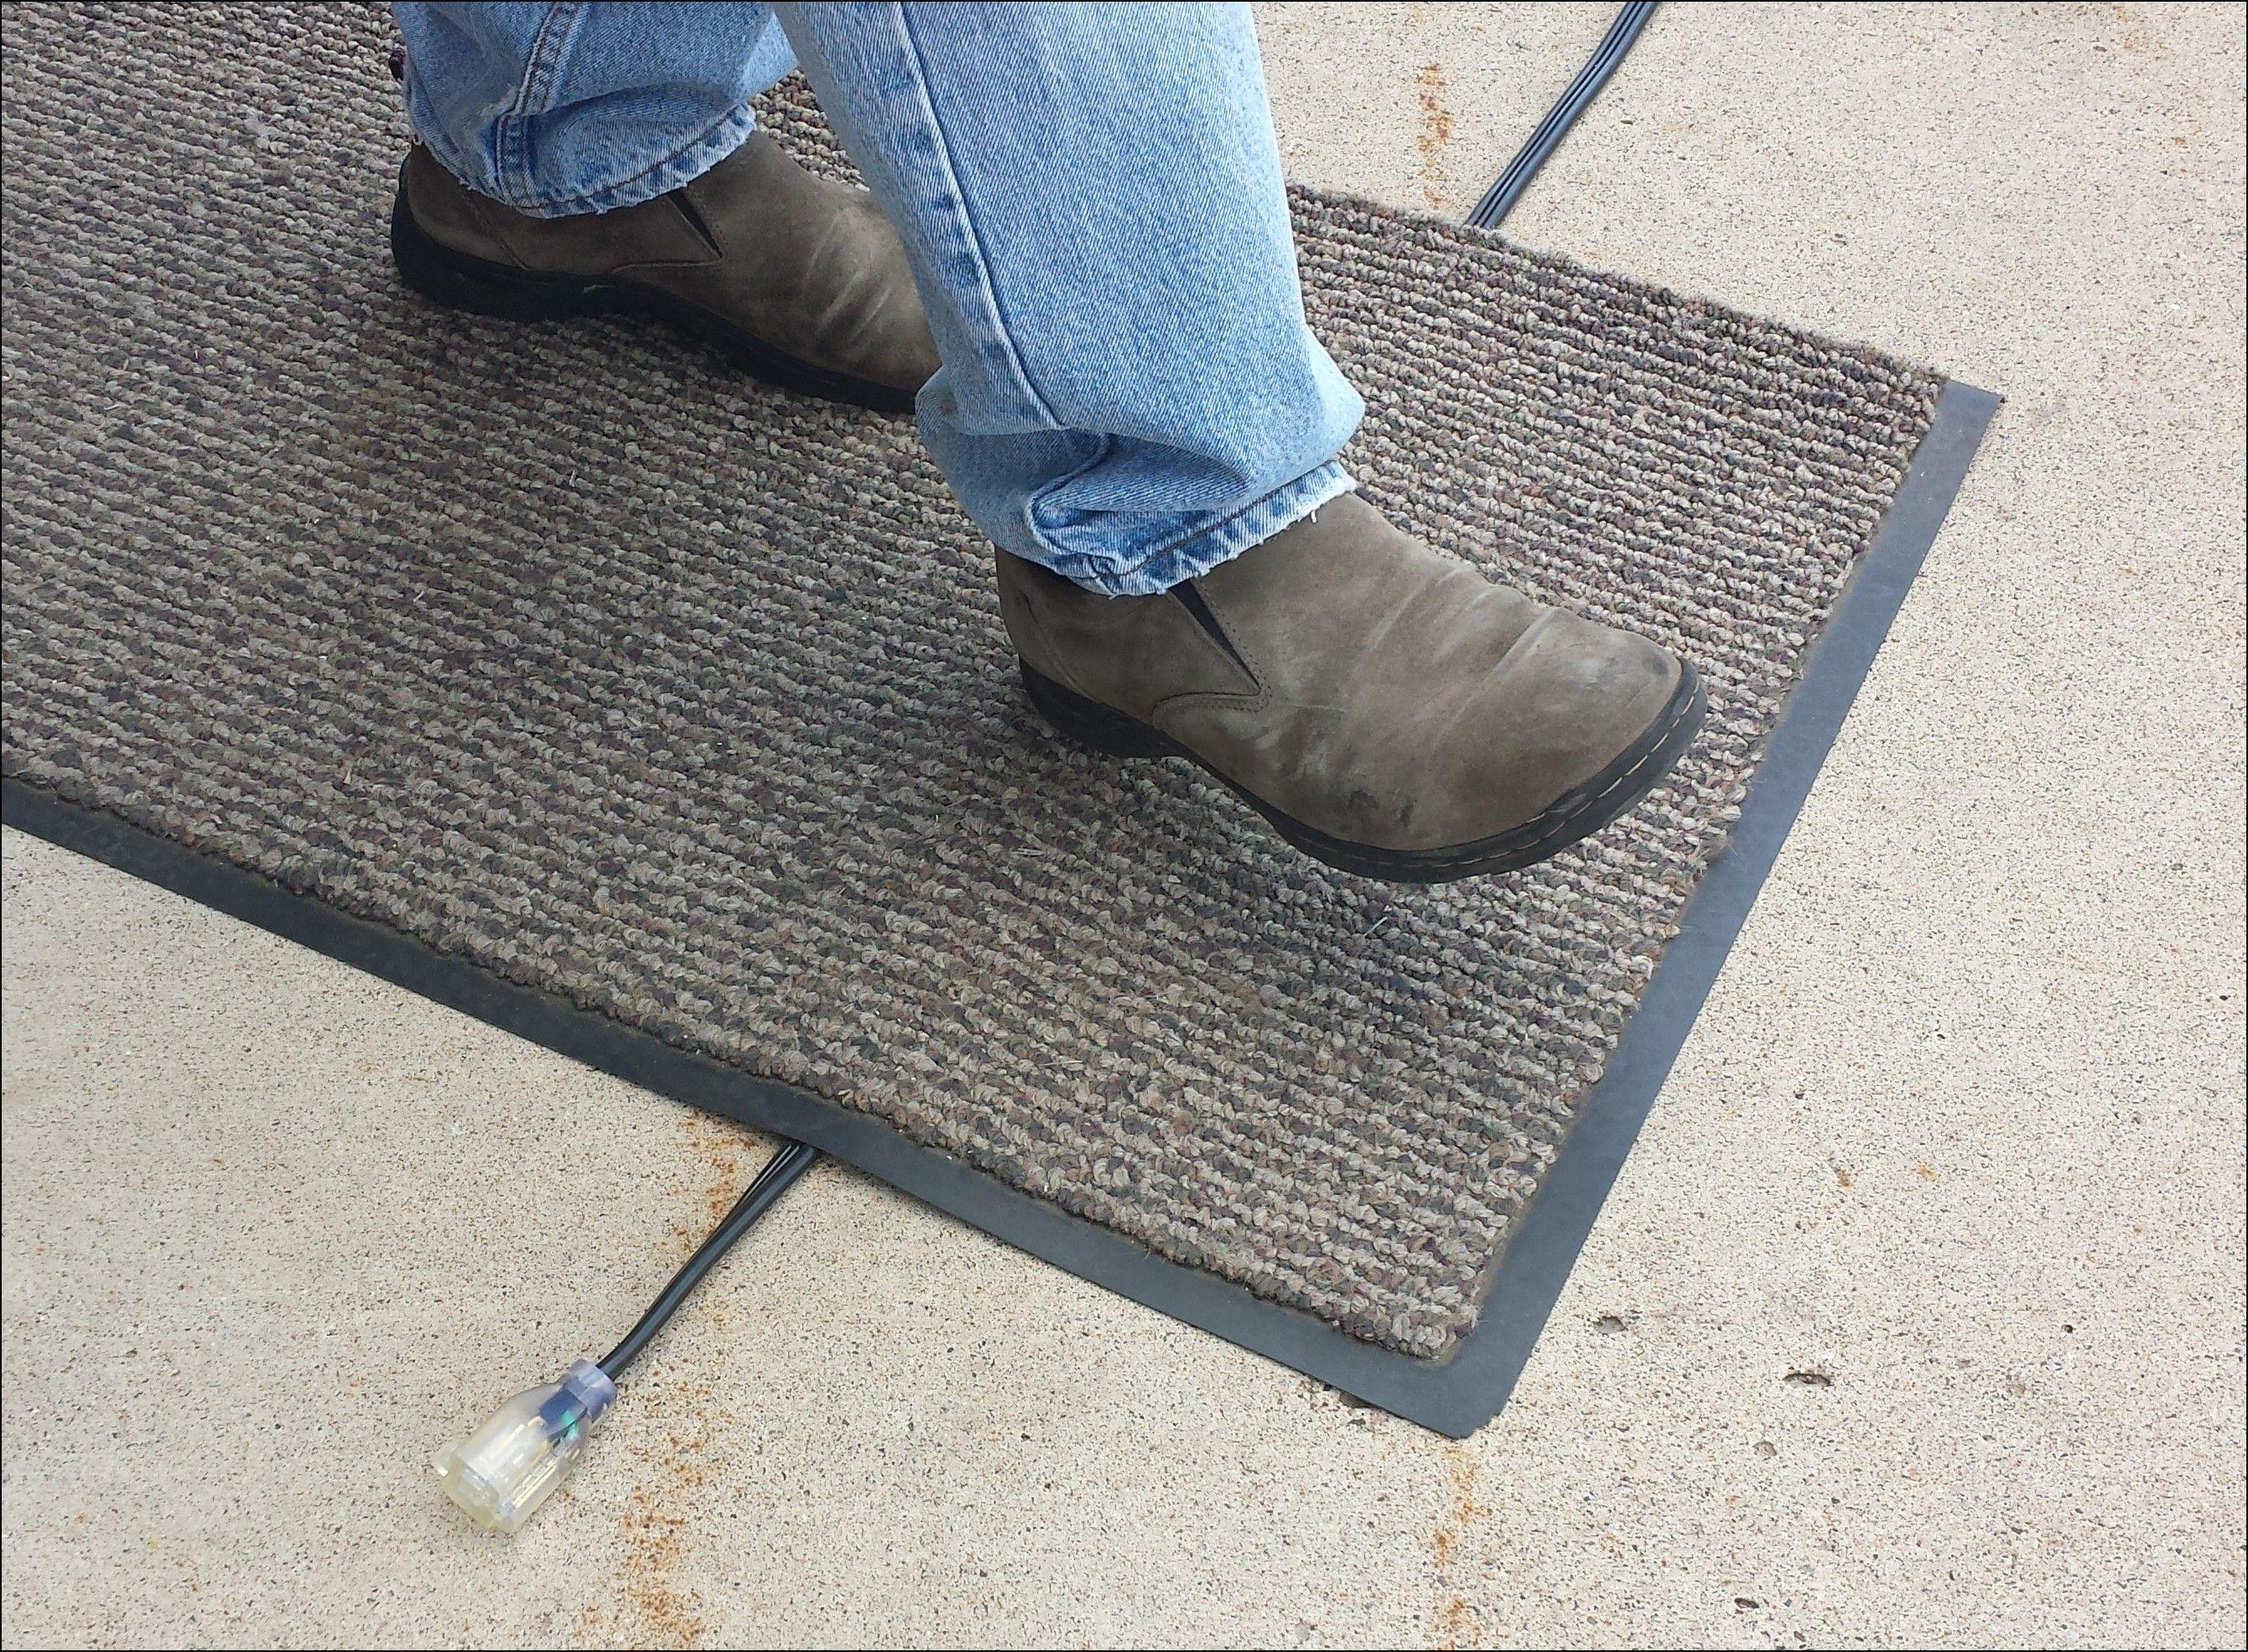 Flat Electrical Cord Under Rug Shapeyourminds Com